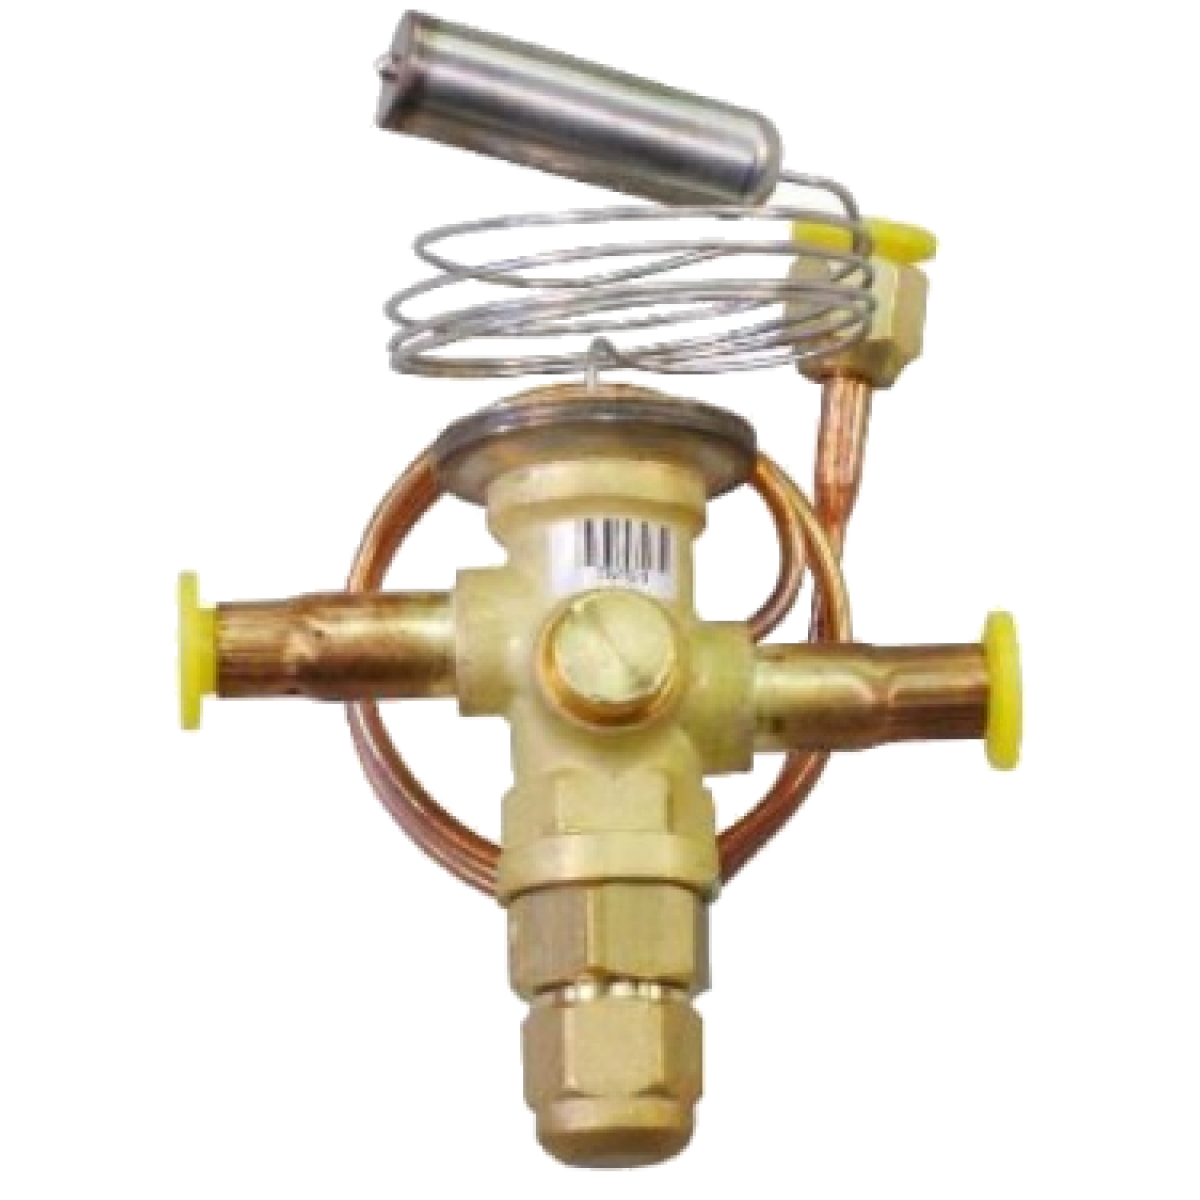 Goodman 5 0 Ton 17 Seer Heat Pump Two Stage Variable Speed